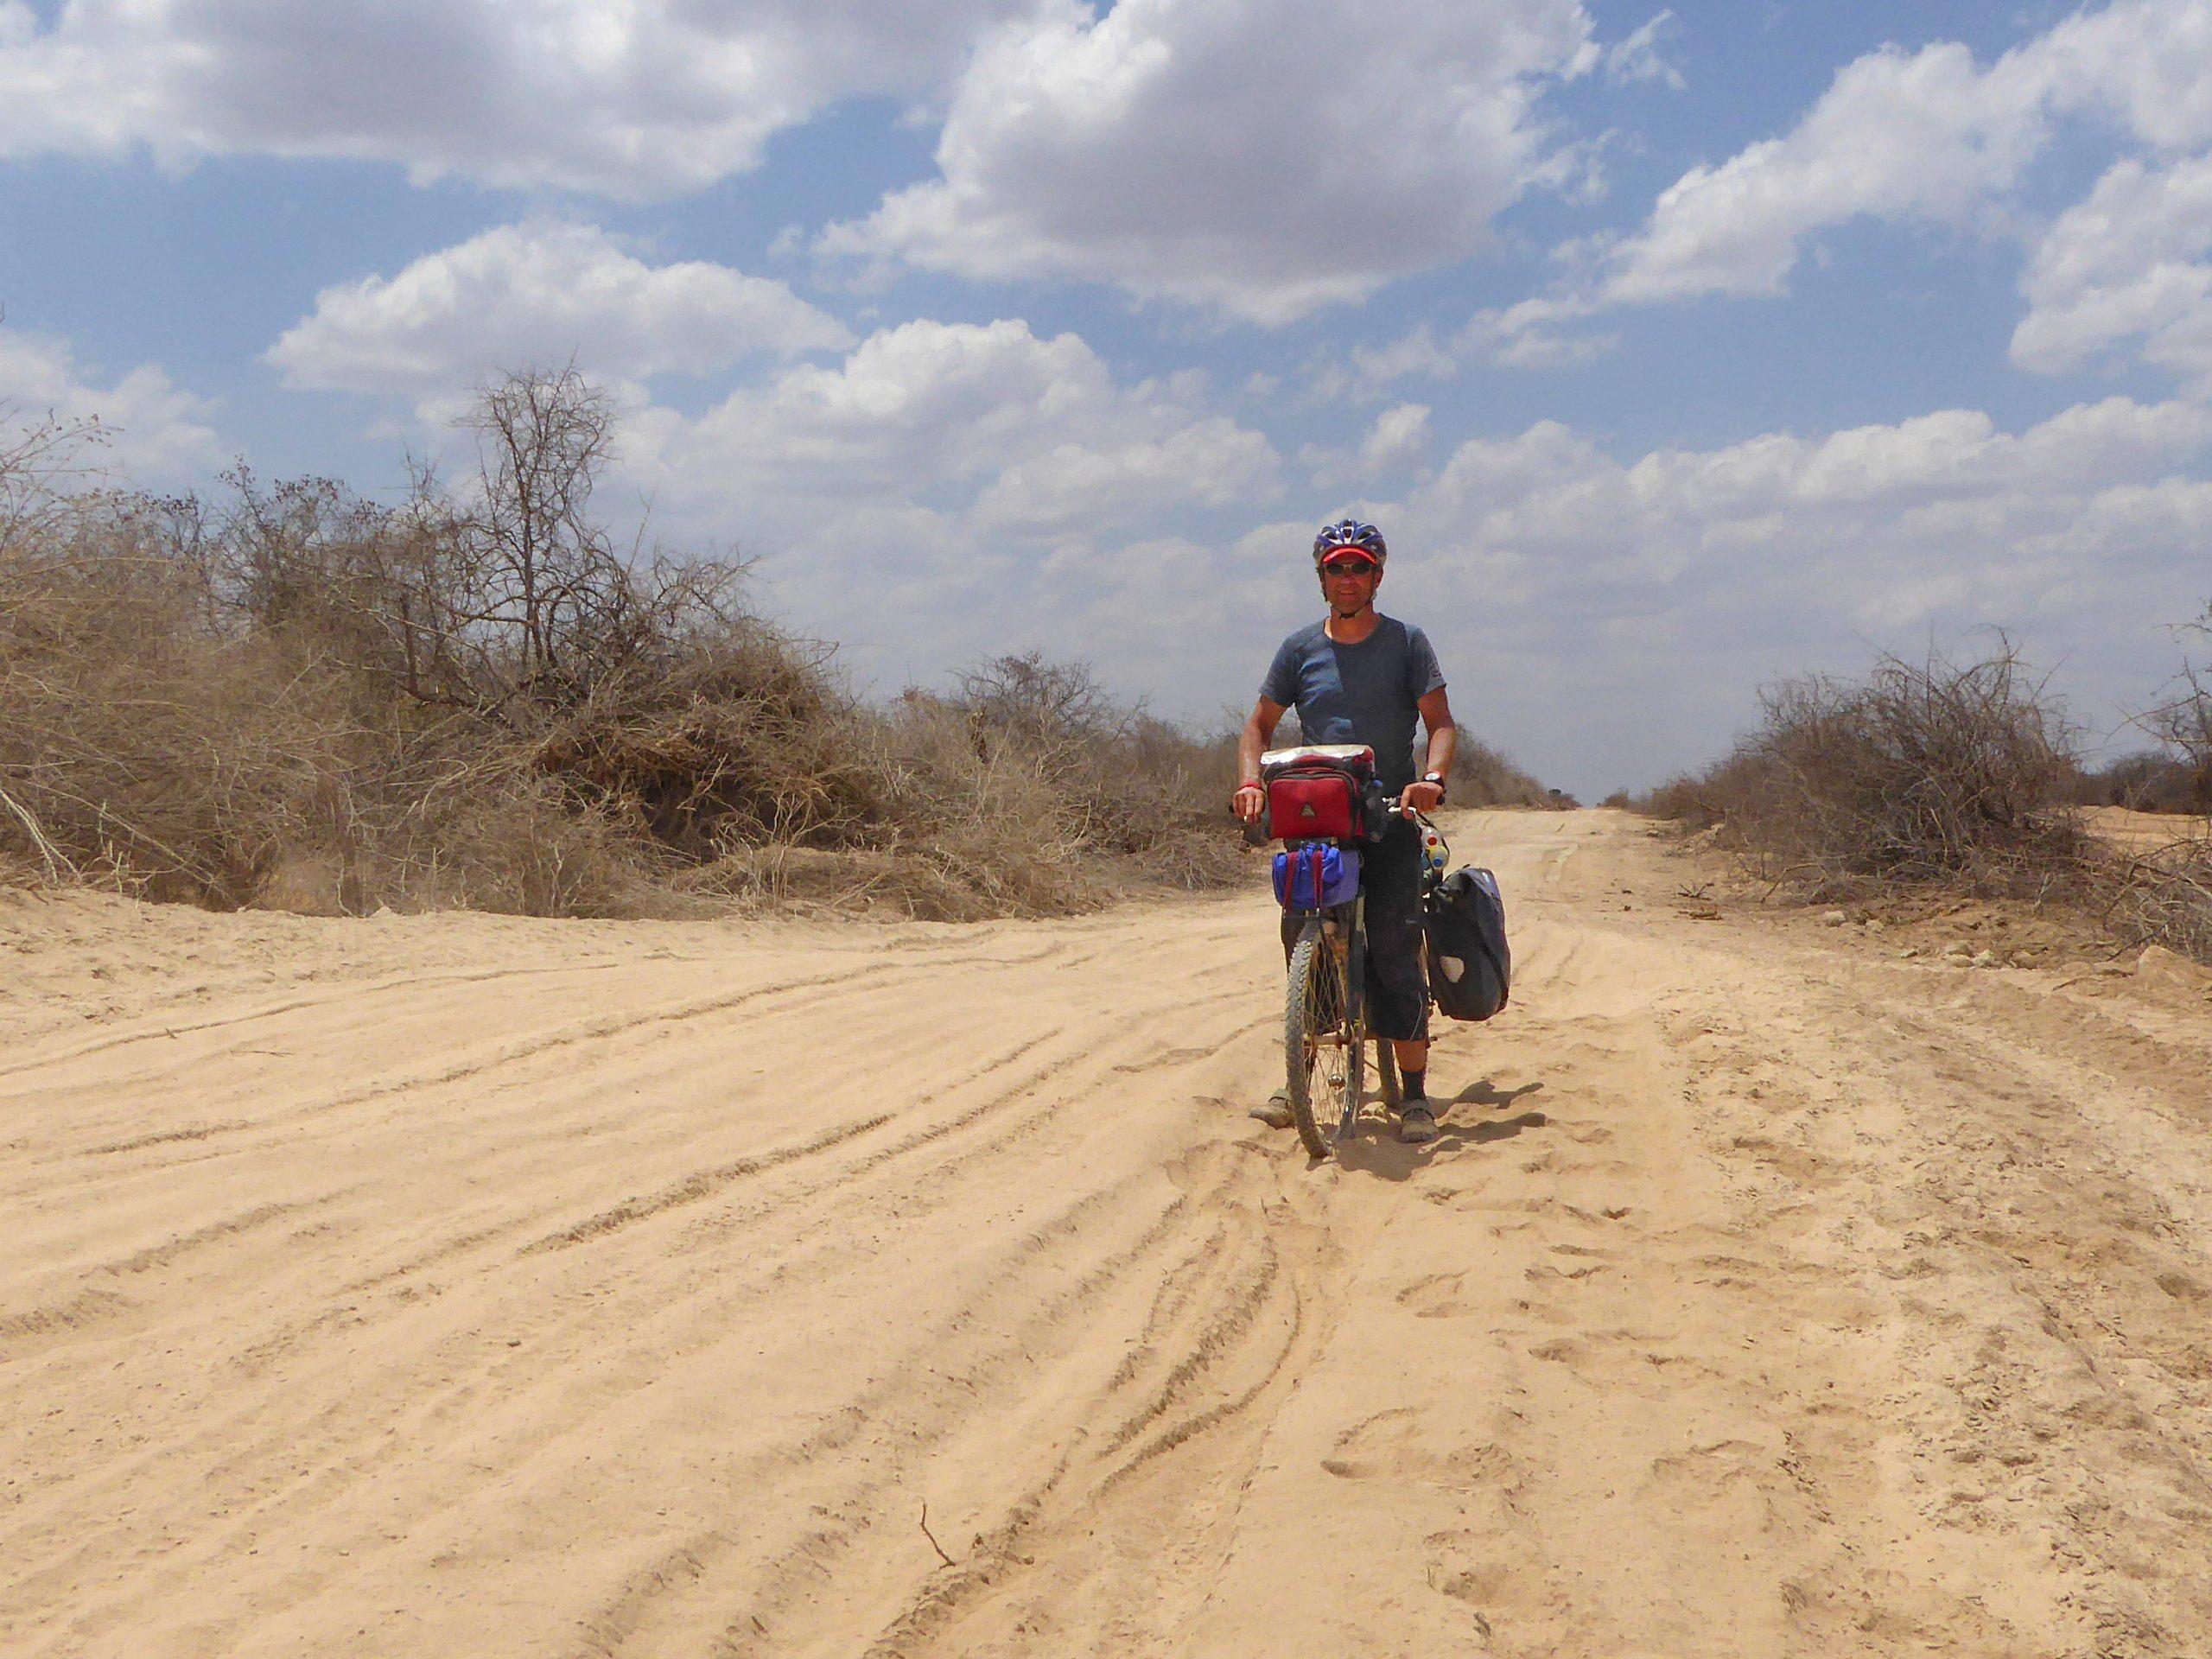 Radreise Afrika 2014 - Sandpiste